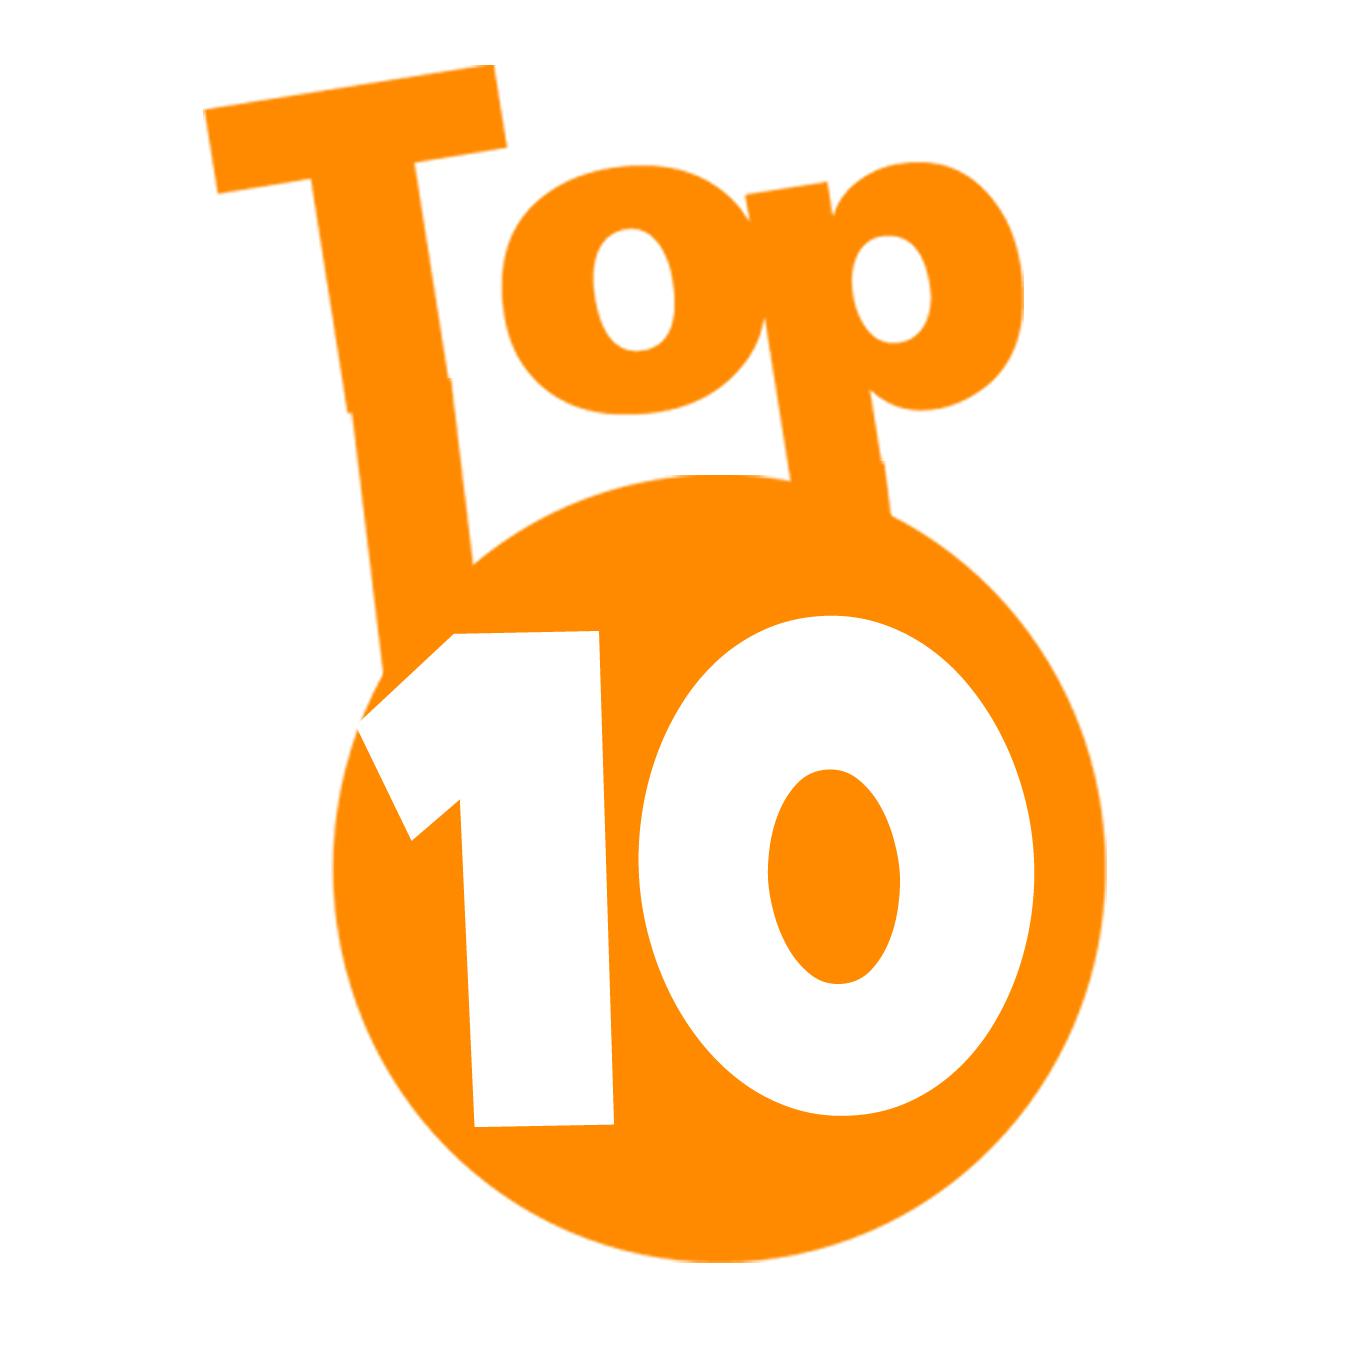 Top 10 Show